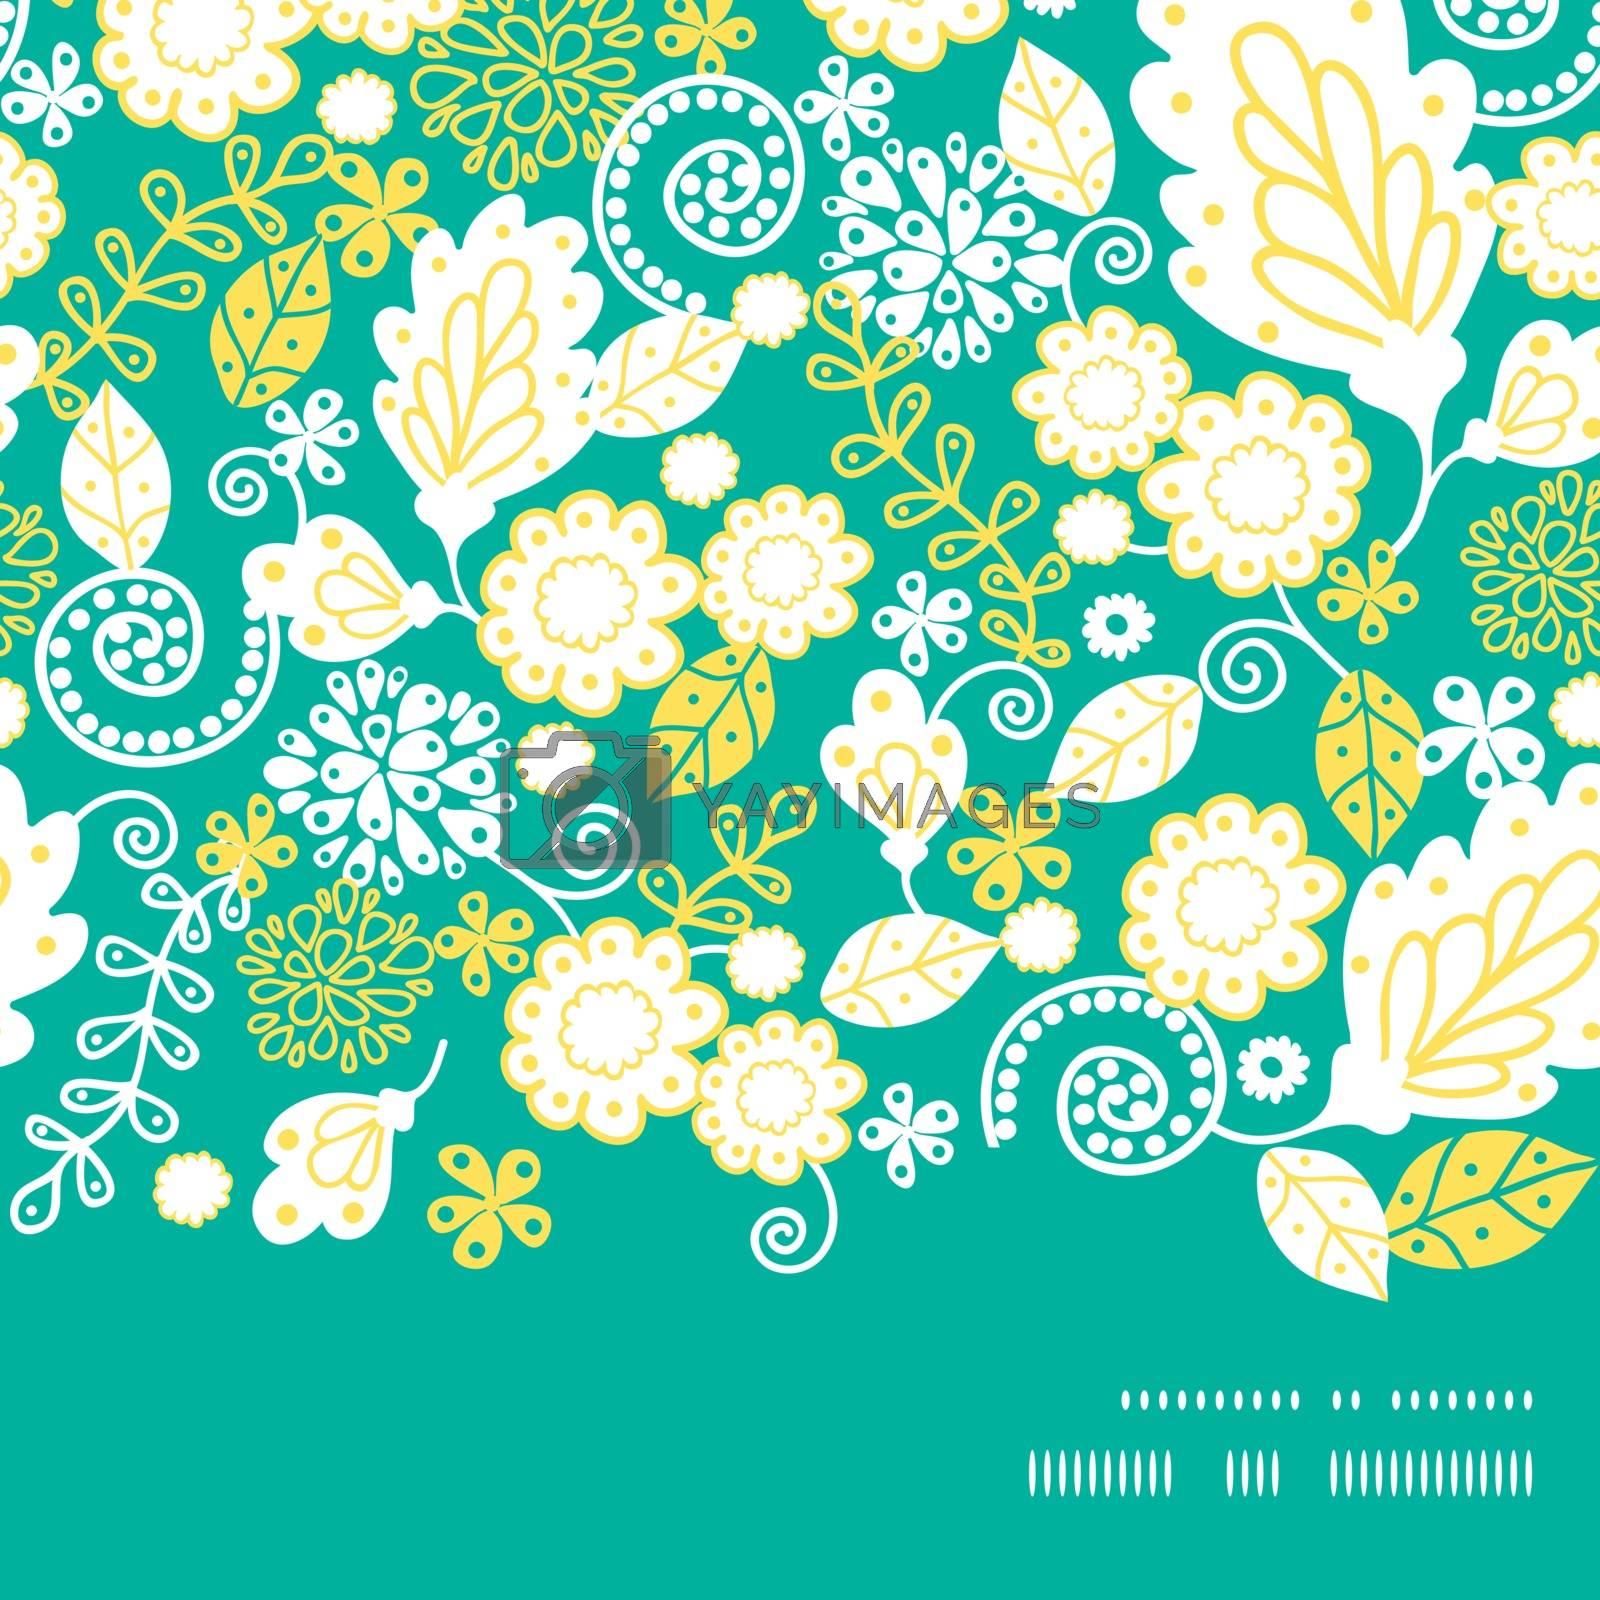 Vector emerald flowerals horizontal frame seamless pattern background graphic design